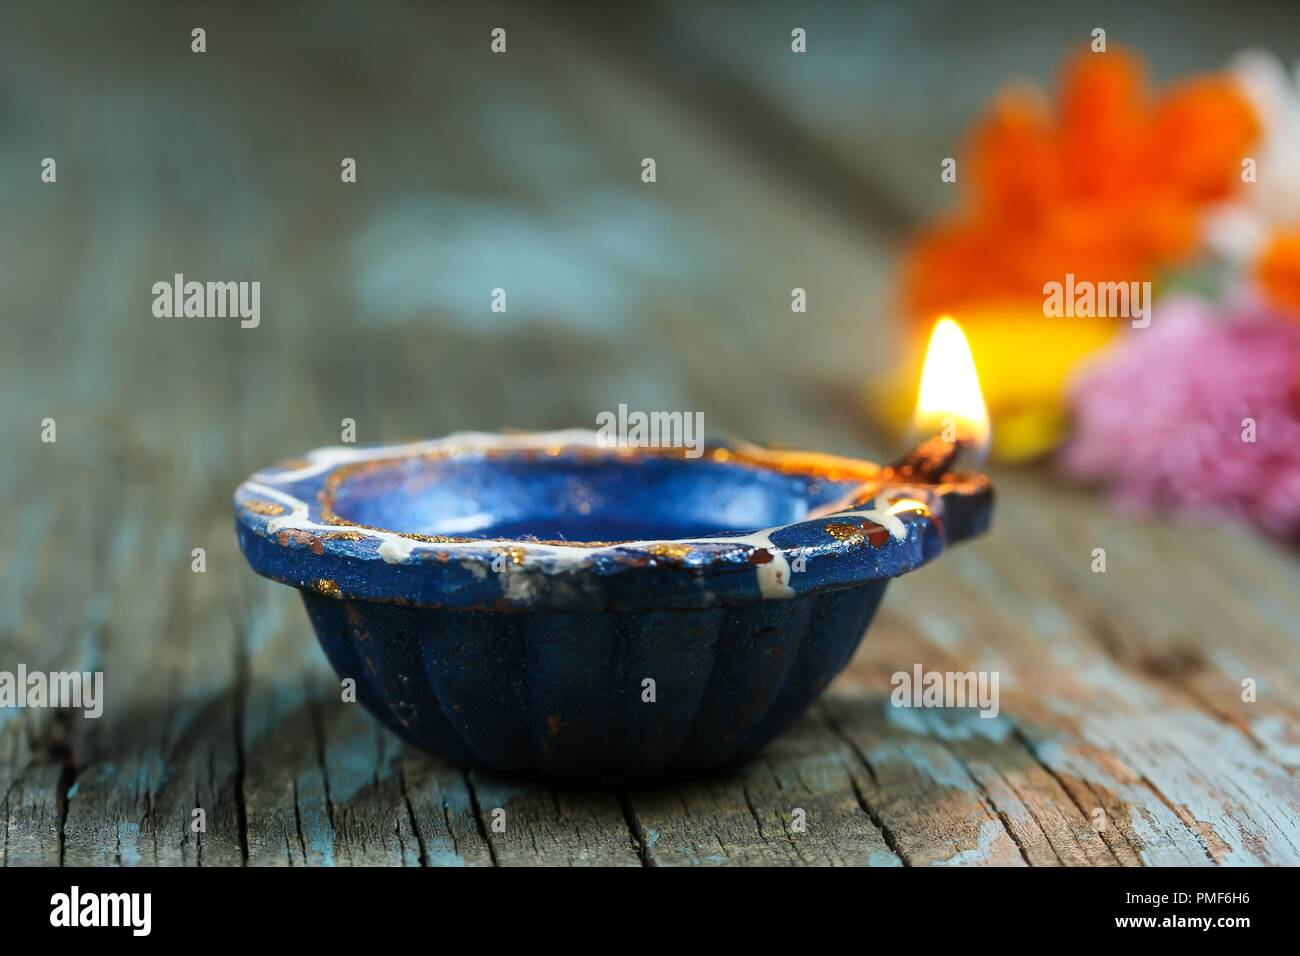 Happy Diwali - Colorful Clay Diya lit during Deepavali festival of lights, selective focus Stock Photo